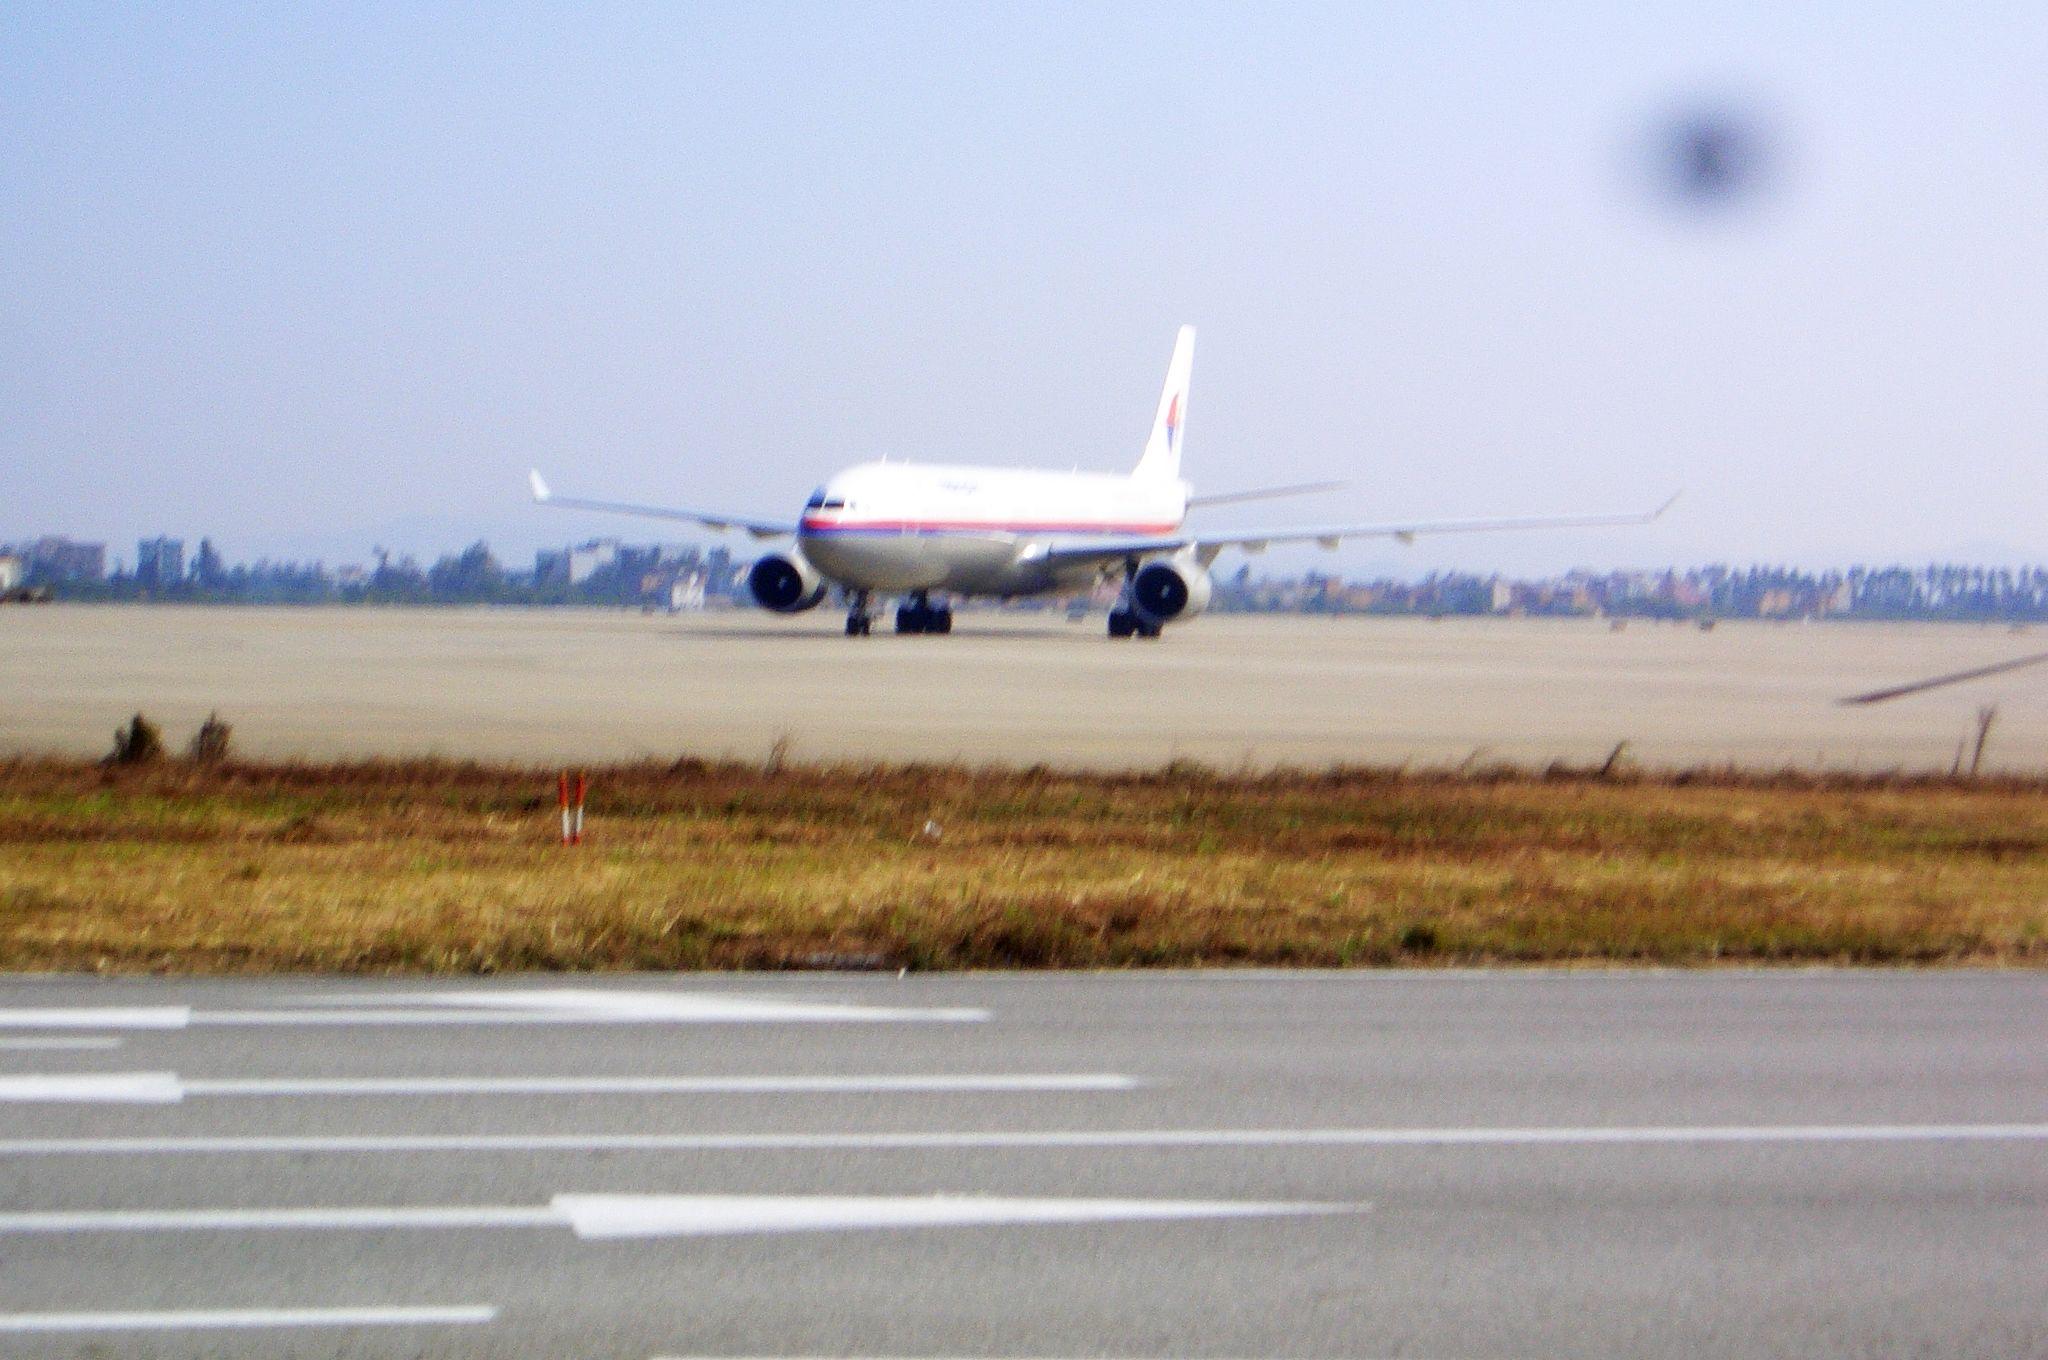 Re:[原创]恢复信心后的第一次发帖,09年第一次活动(关键字:国航彩绘,立荣包机) MCDONNELL DOUGLAS MD-90 B-17911 中国广州白云机场 中国广州白云机场